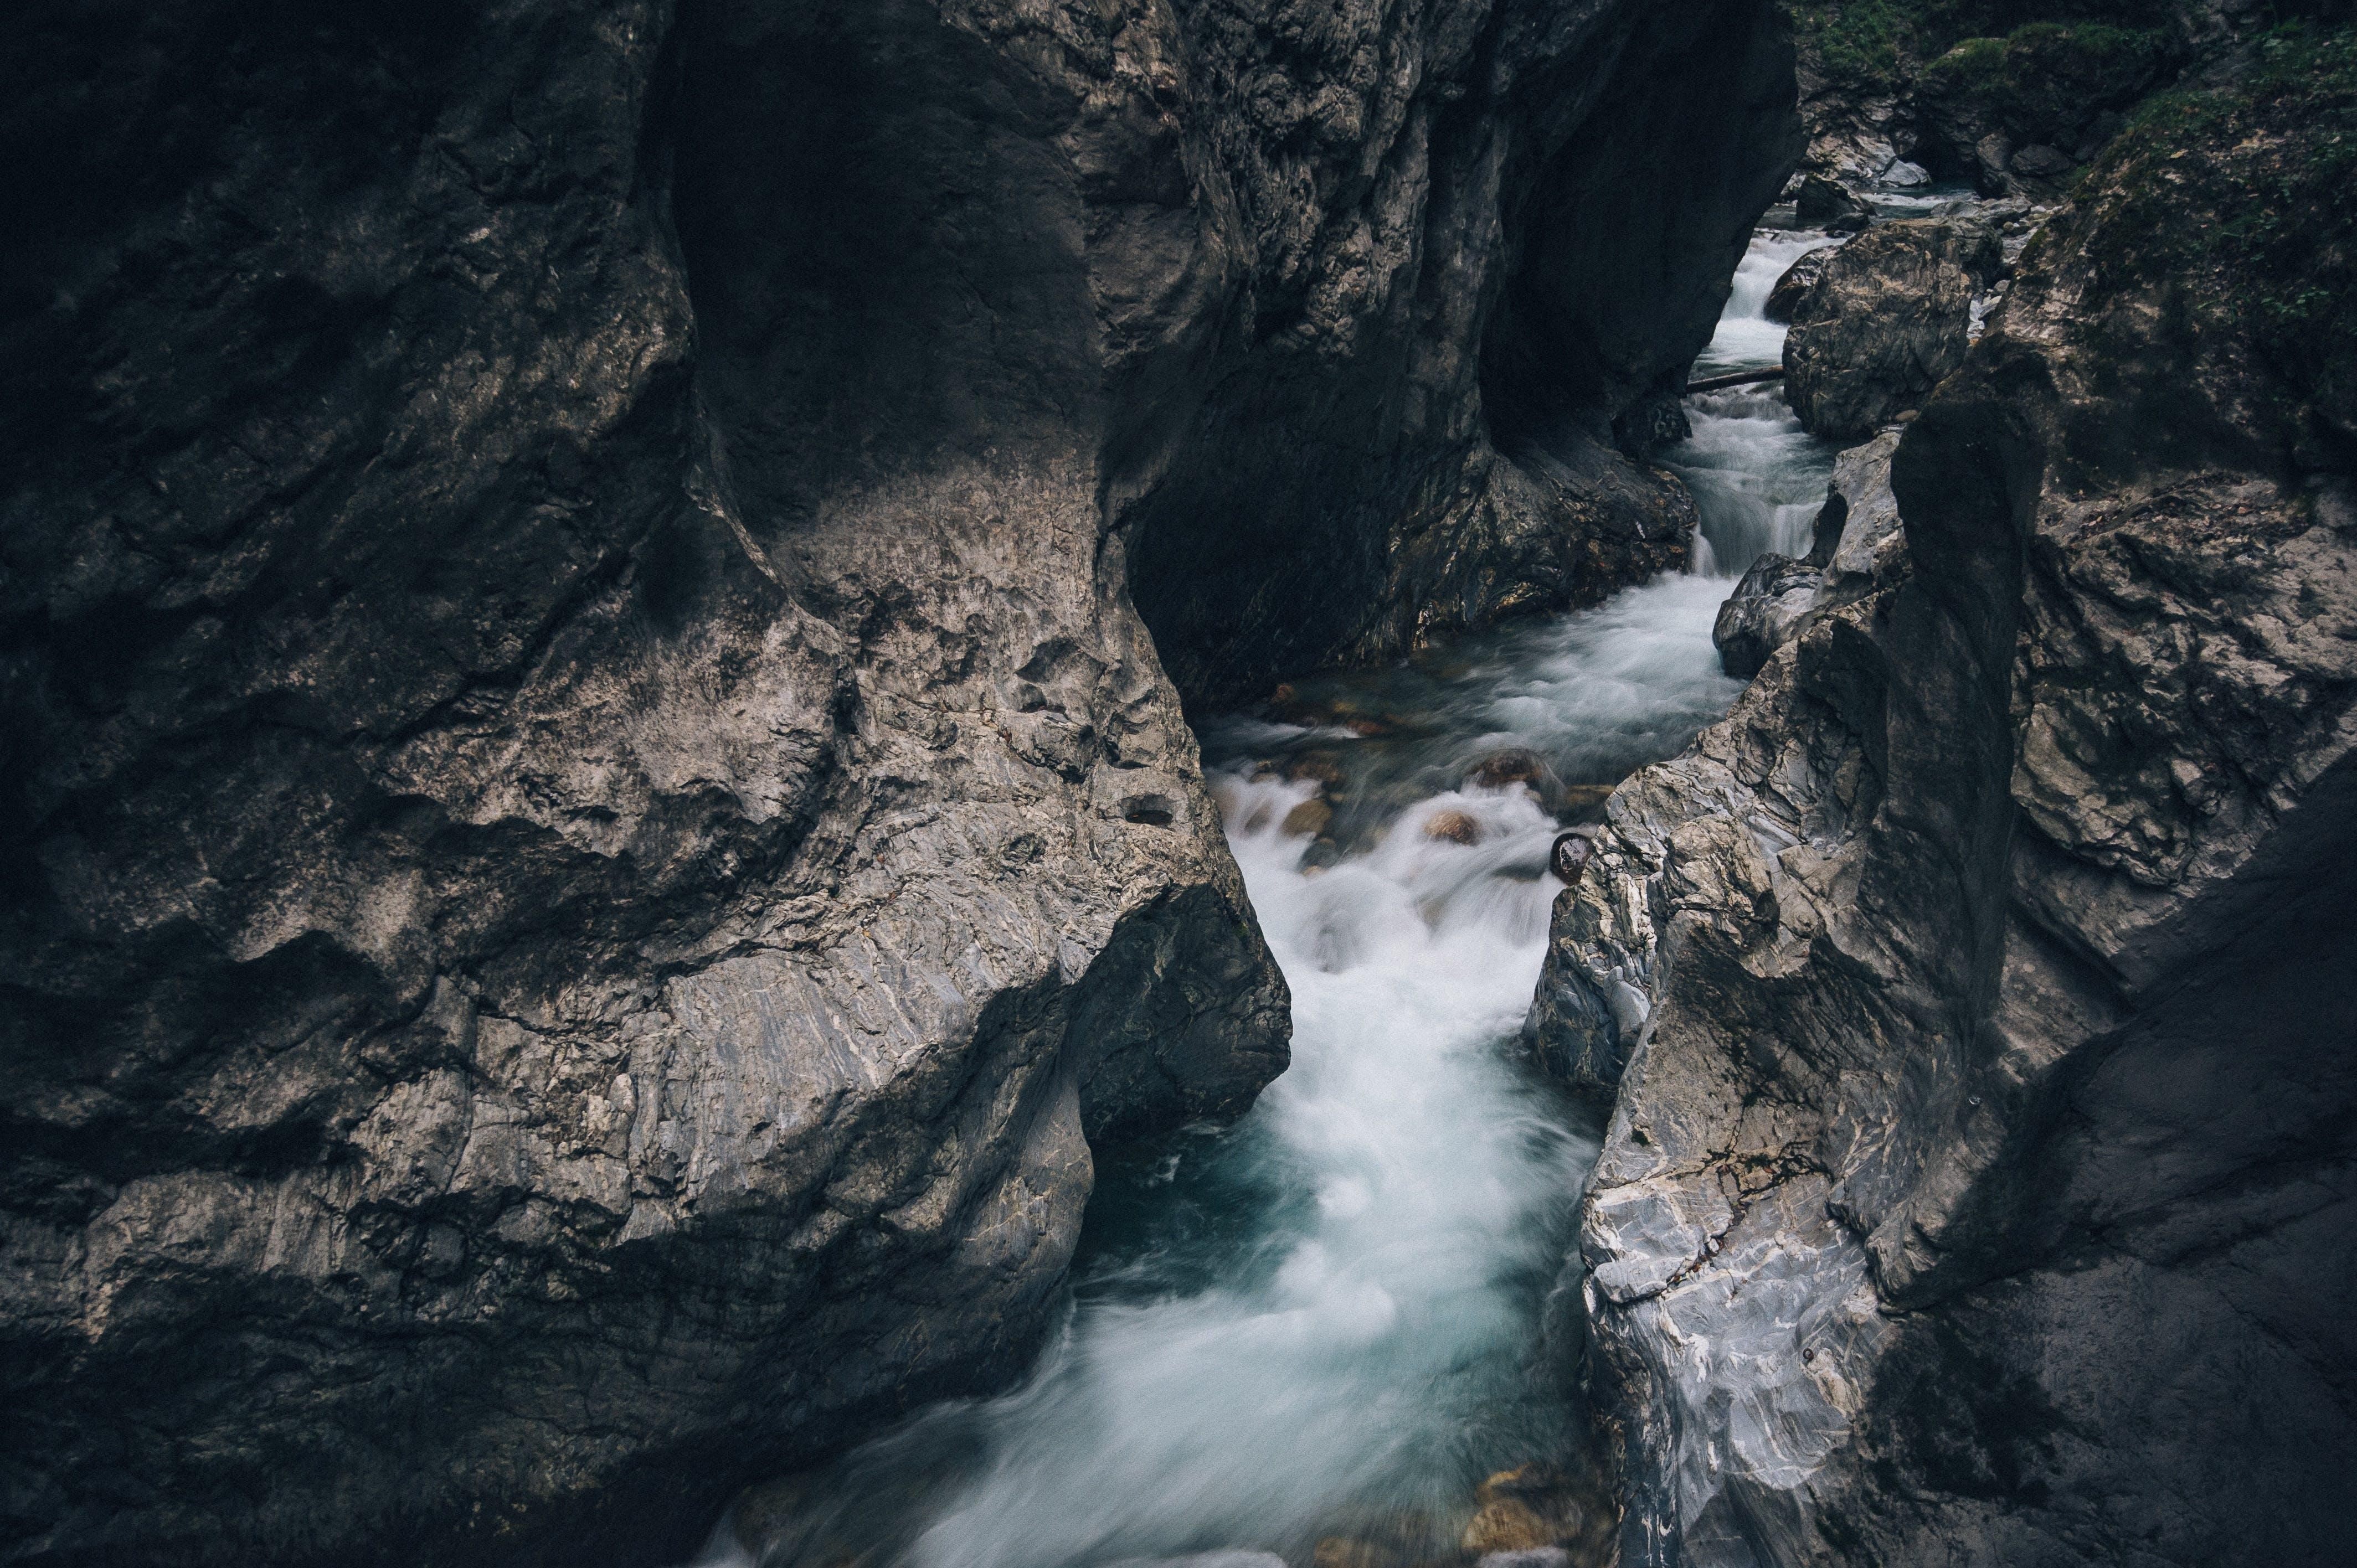 Sea Water Running in Between Rock Crevices